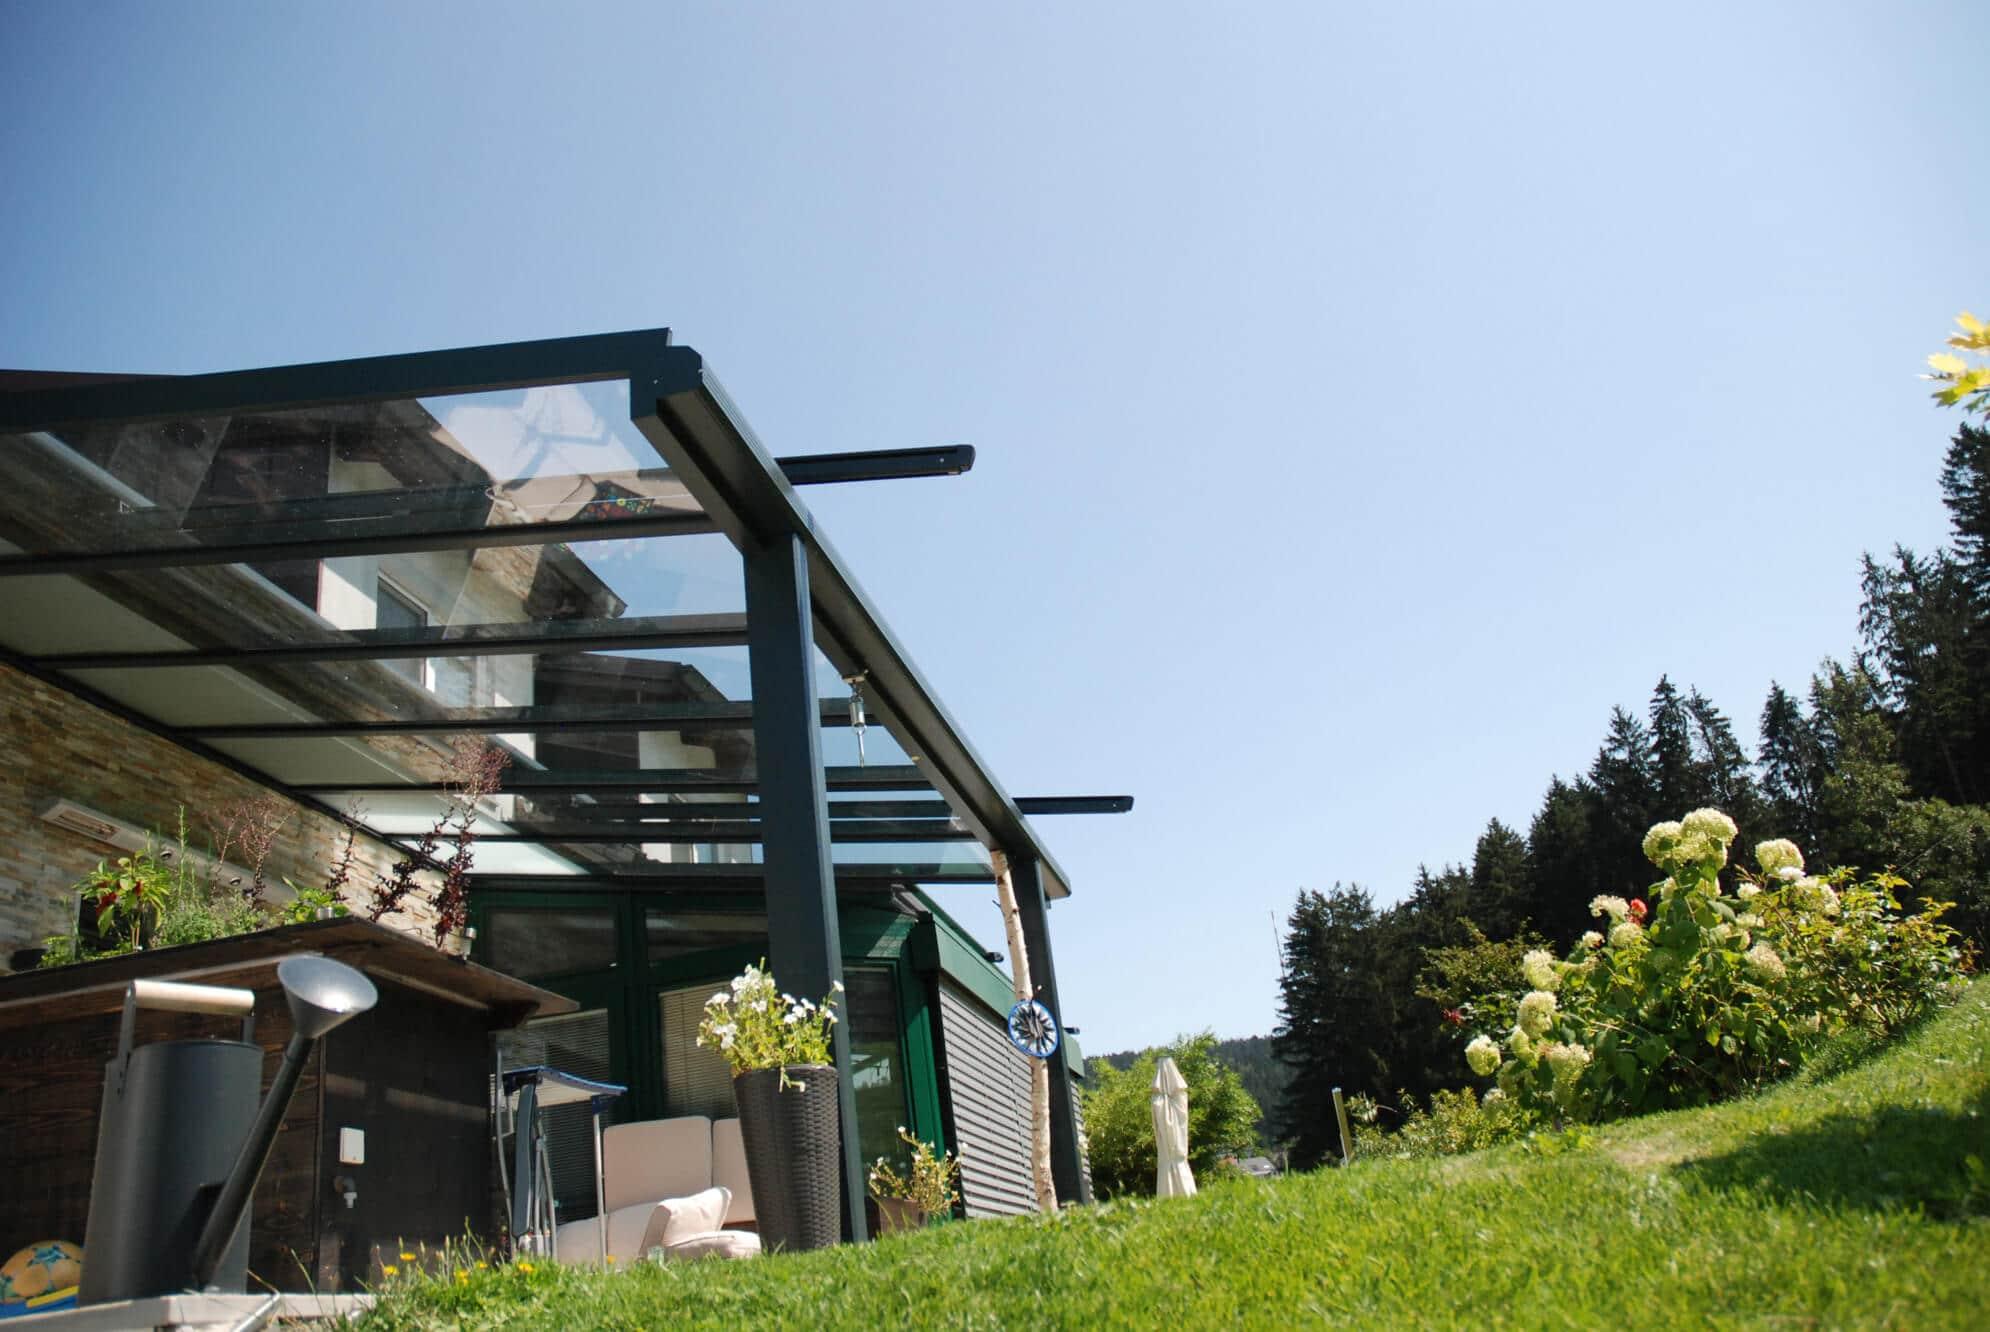 Terrassenüberdachung Alu Glas anthrazit RAL 7016